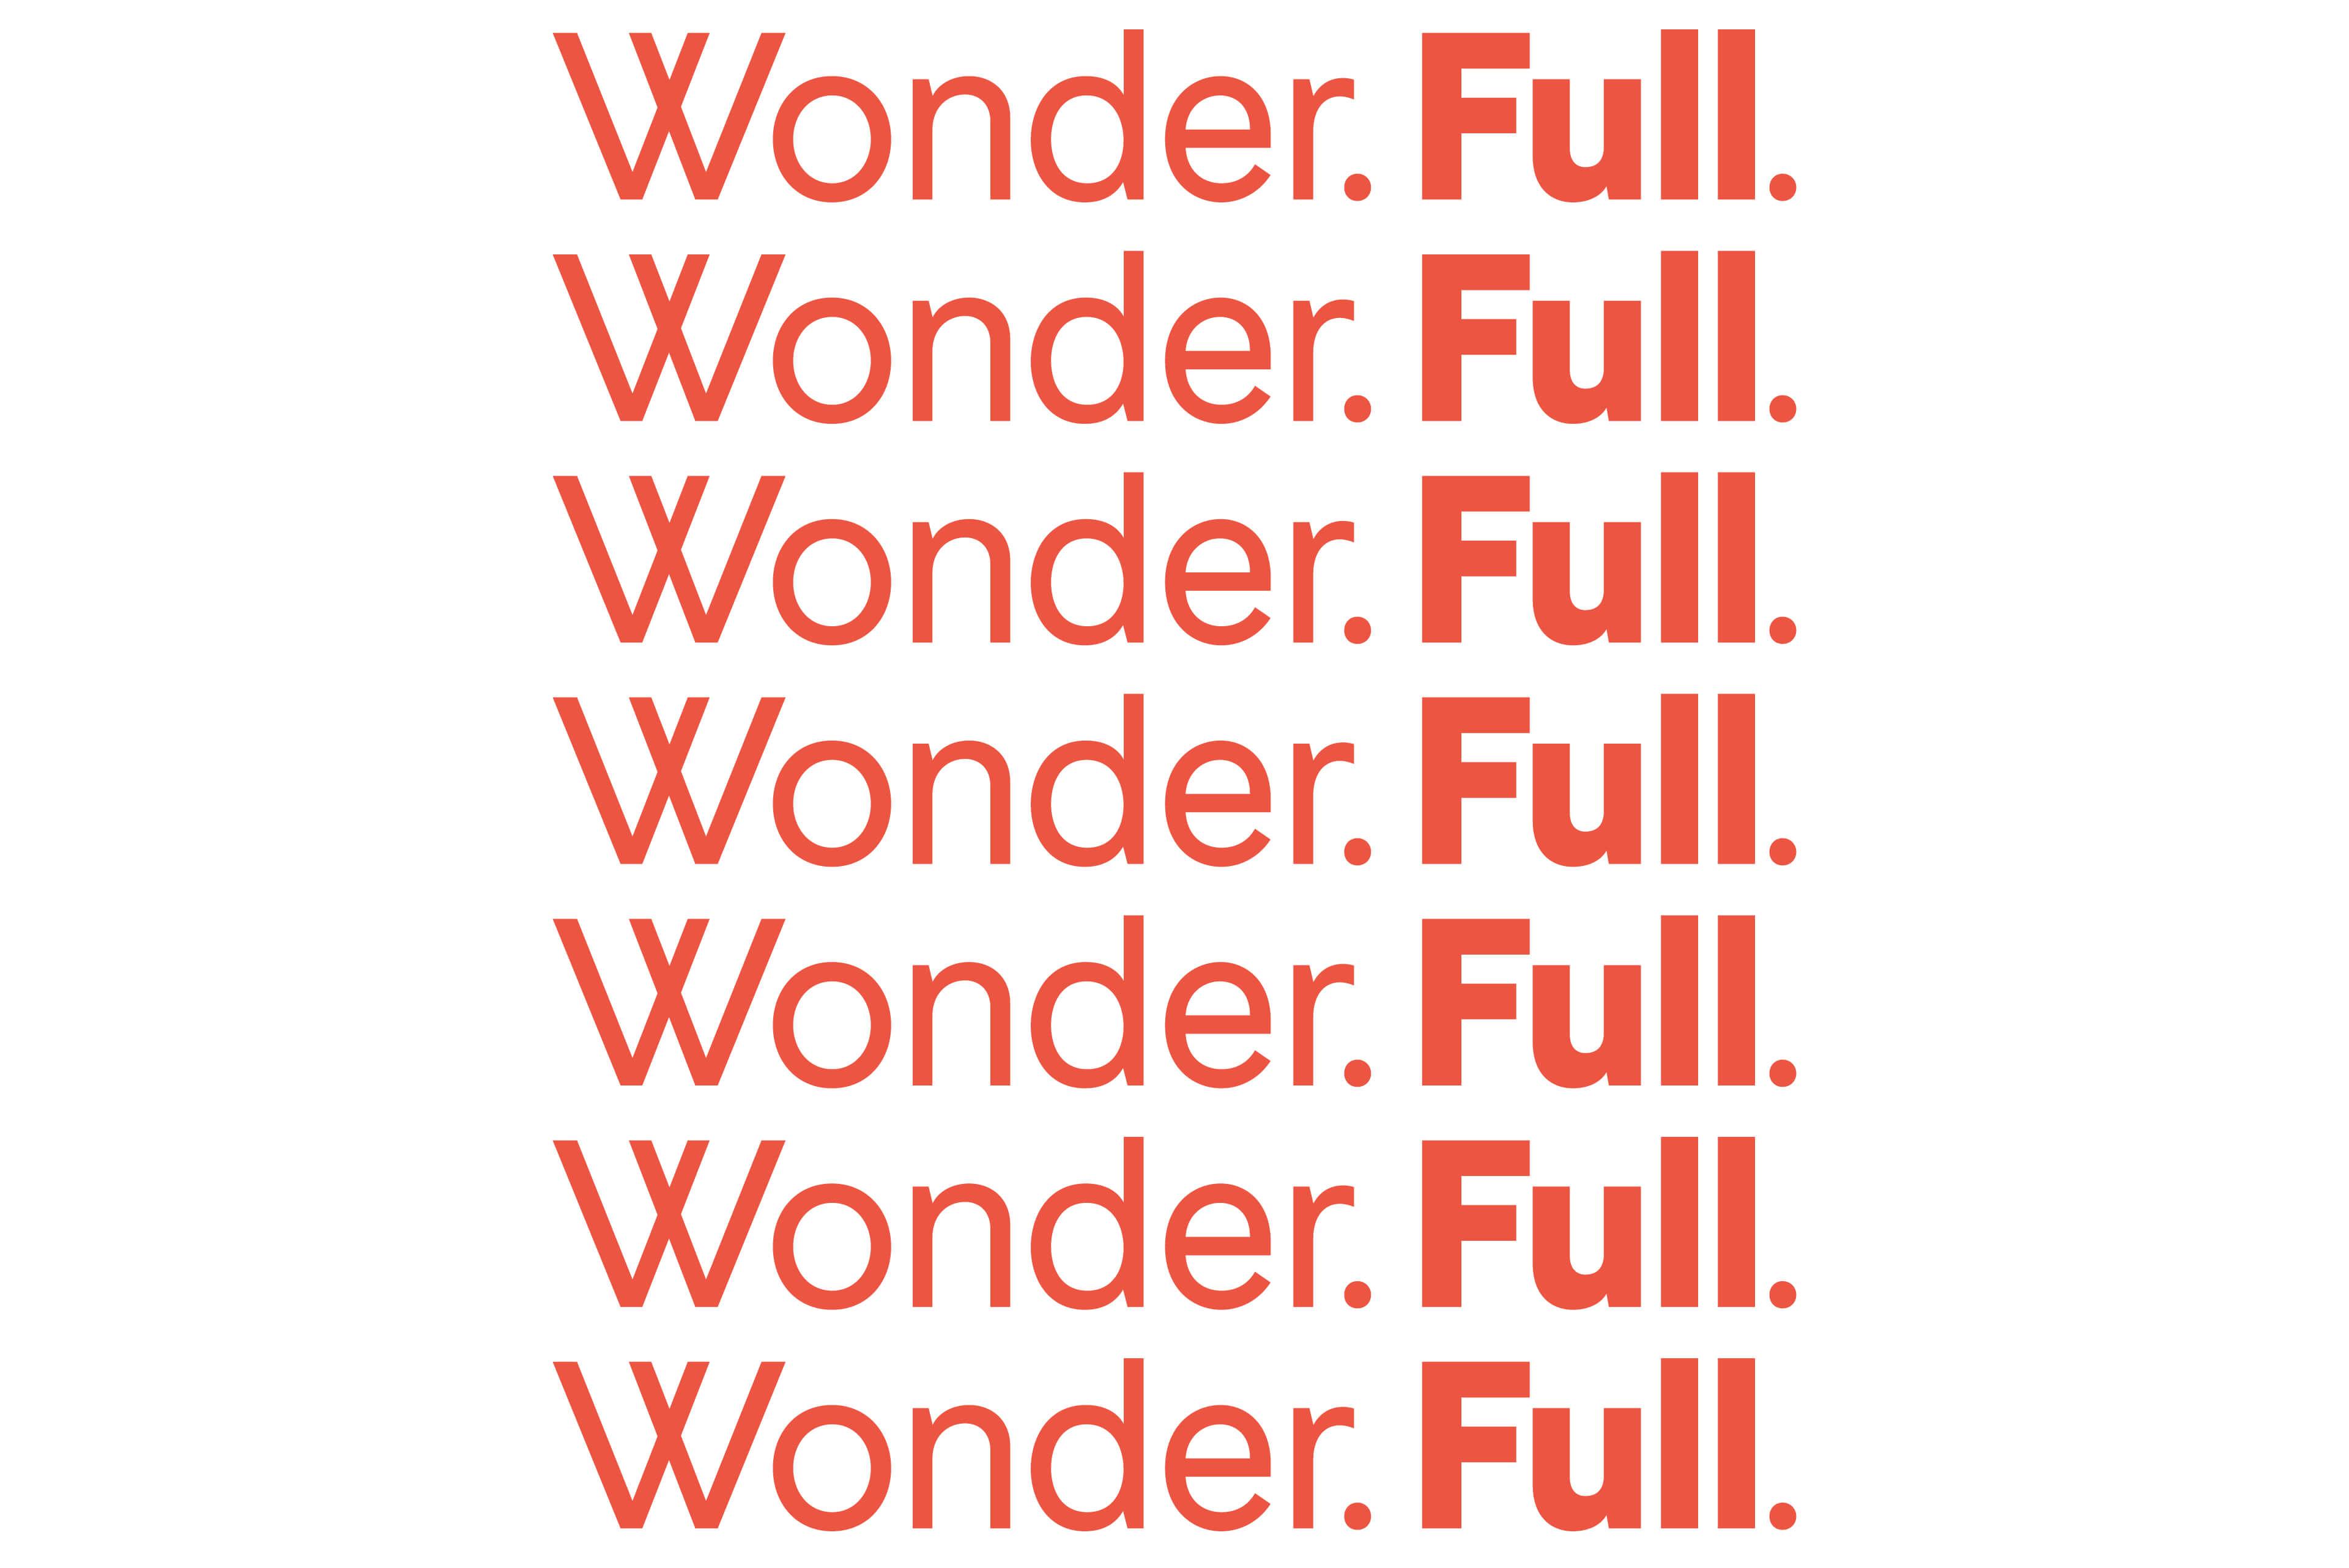 Ovolo Hotels Brand Refresh - Wonder. Full. Typography Statement